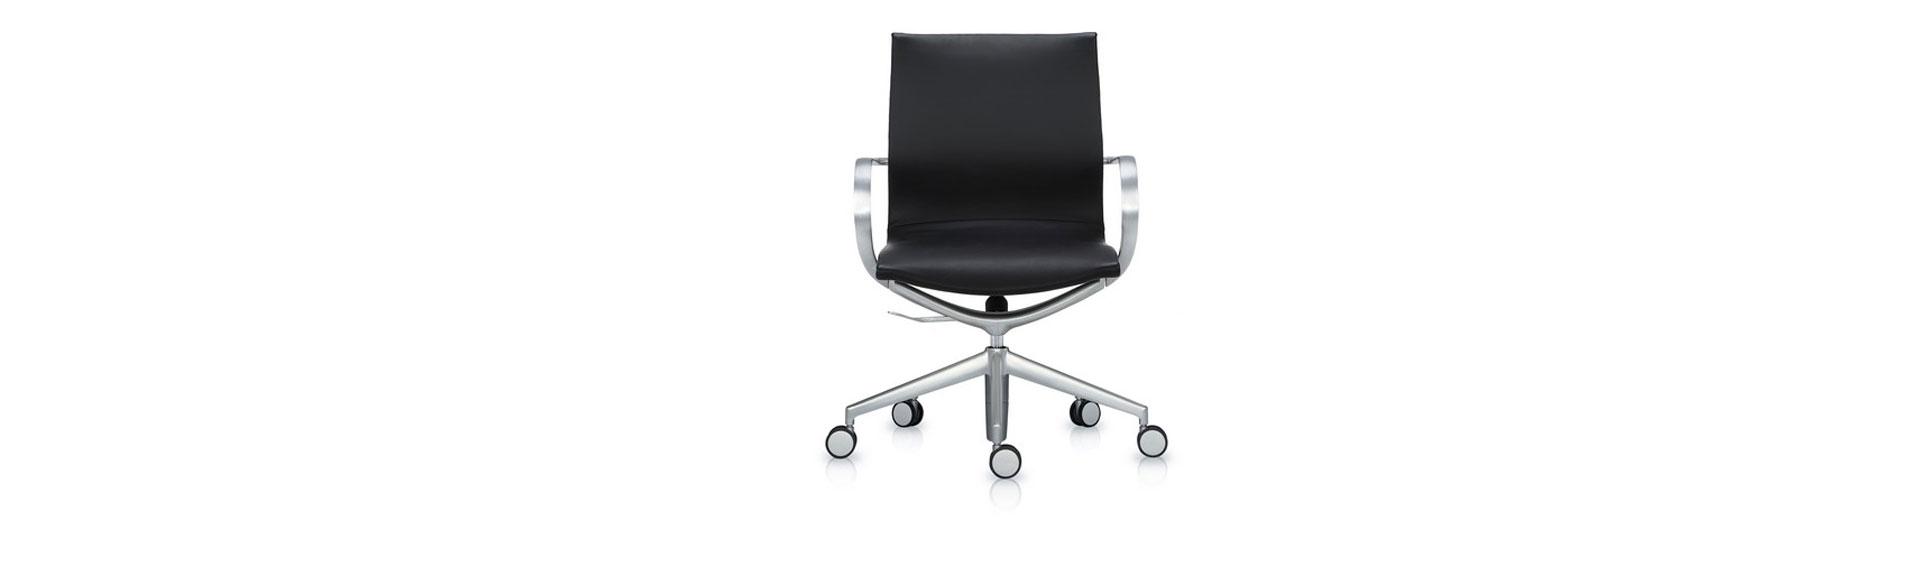 Mercury系列-会议椅_28.jpg